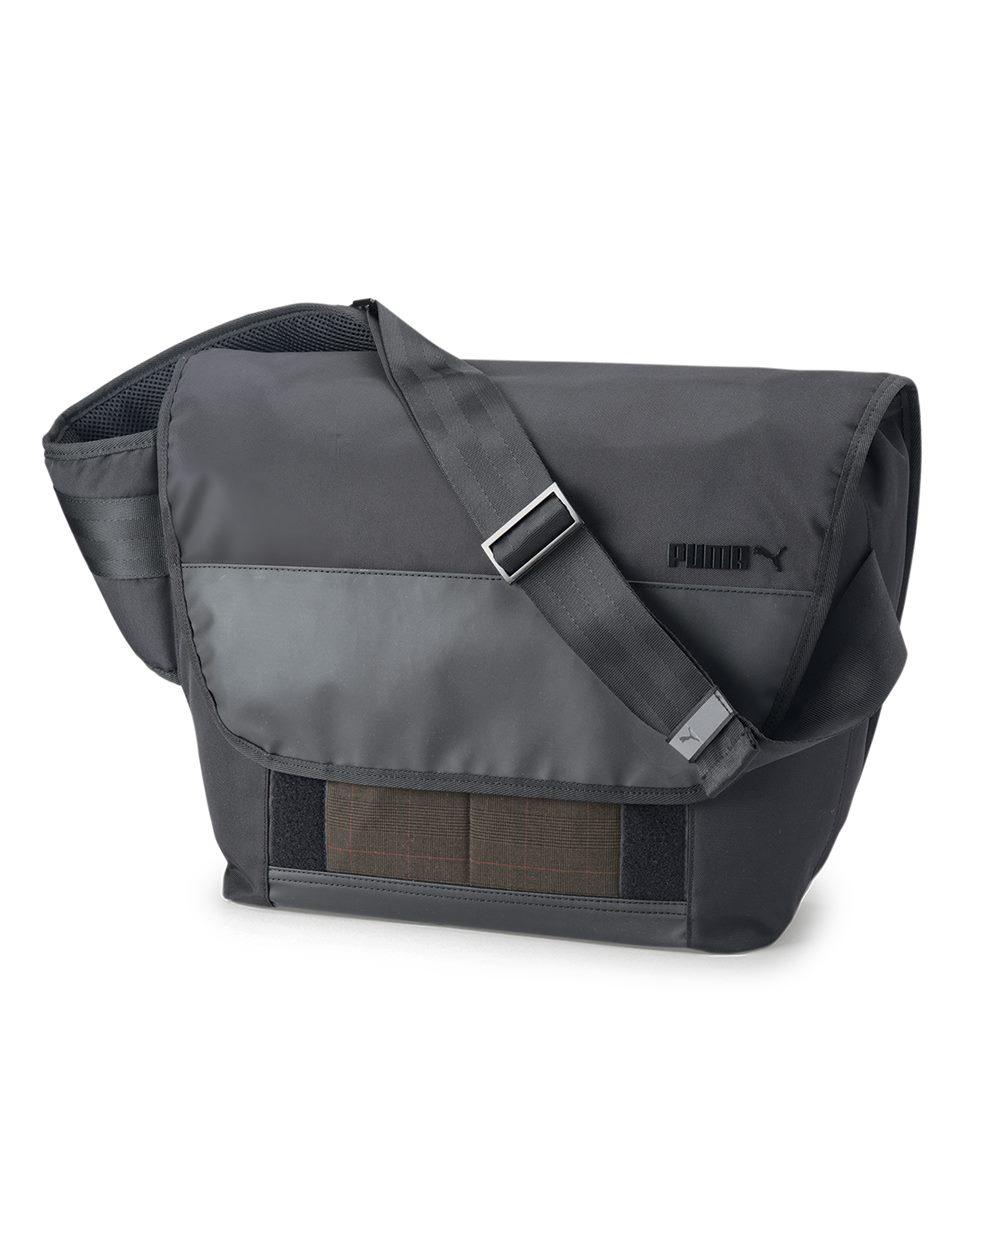 PUMA PSC1009 - Droptop Messenger Bag